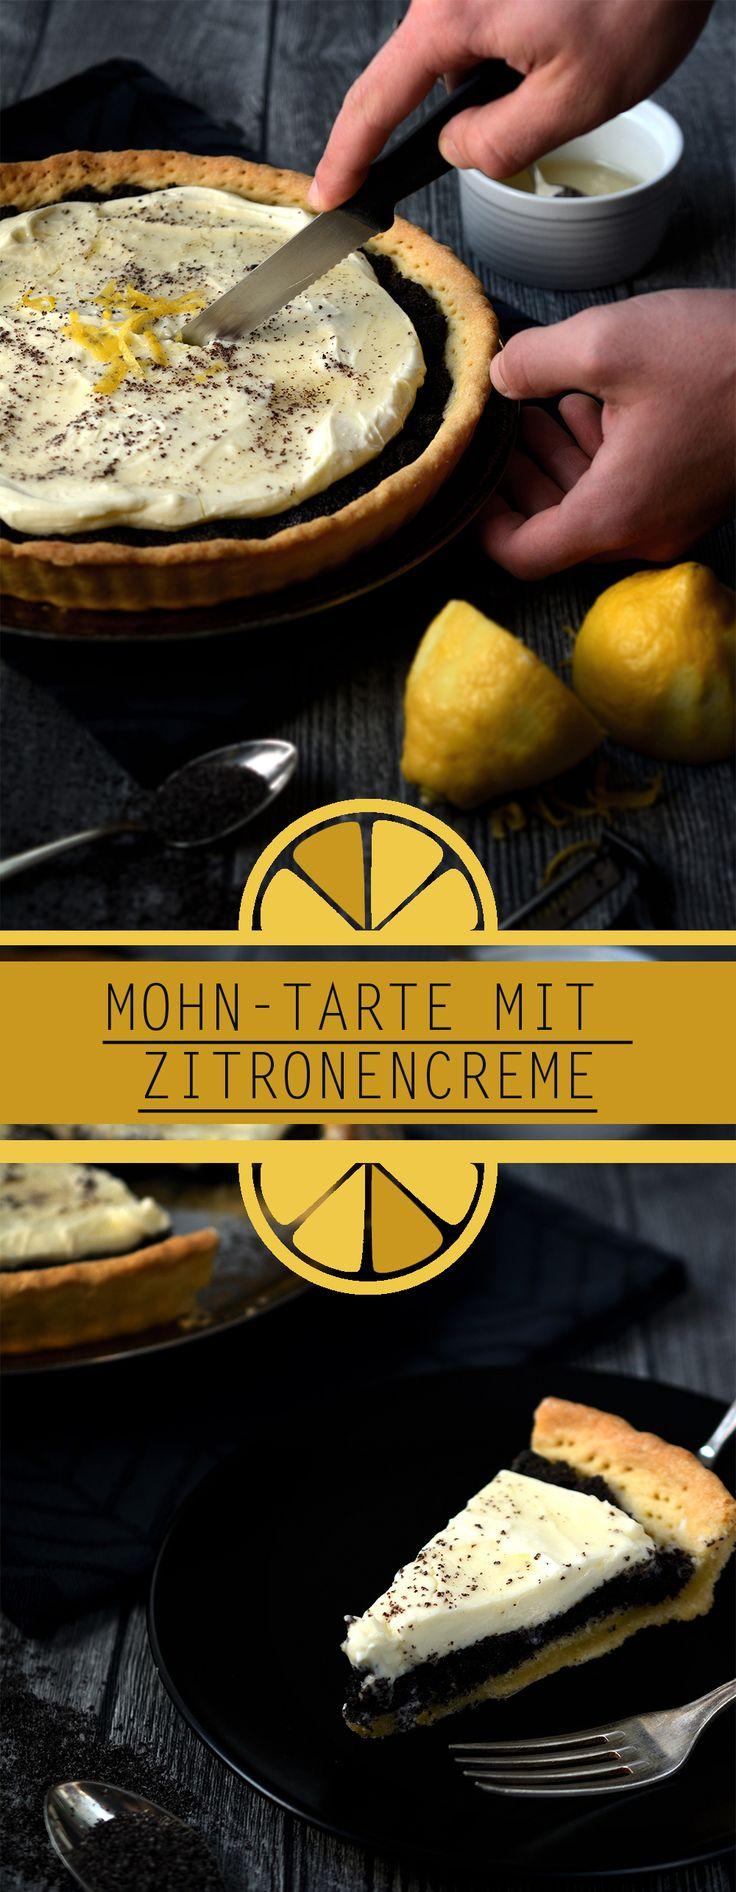 Poppy Seed Tart with lemon cream  /// Mohn-Tarte mit Zitronencreme